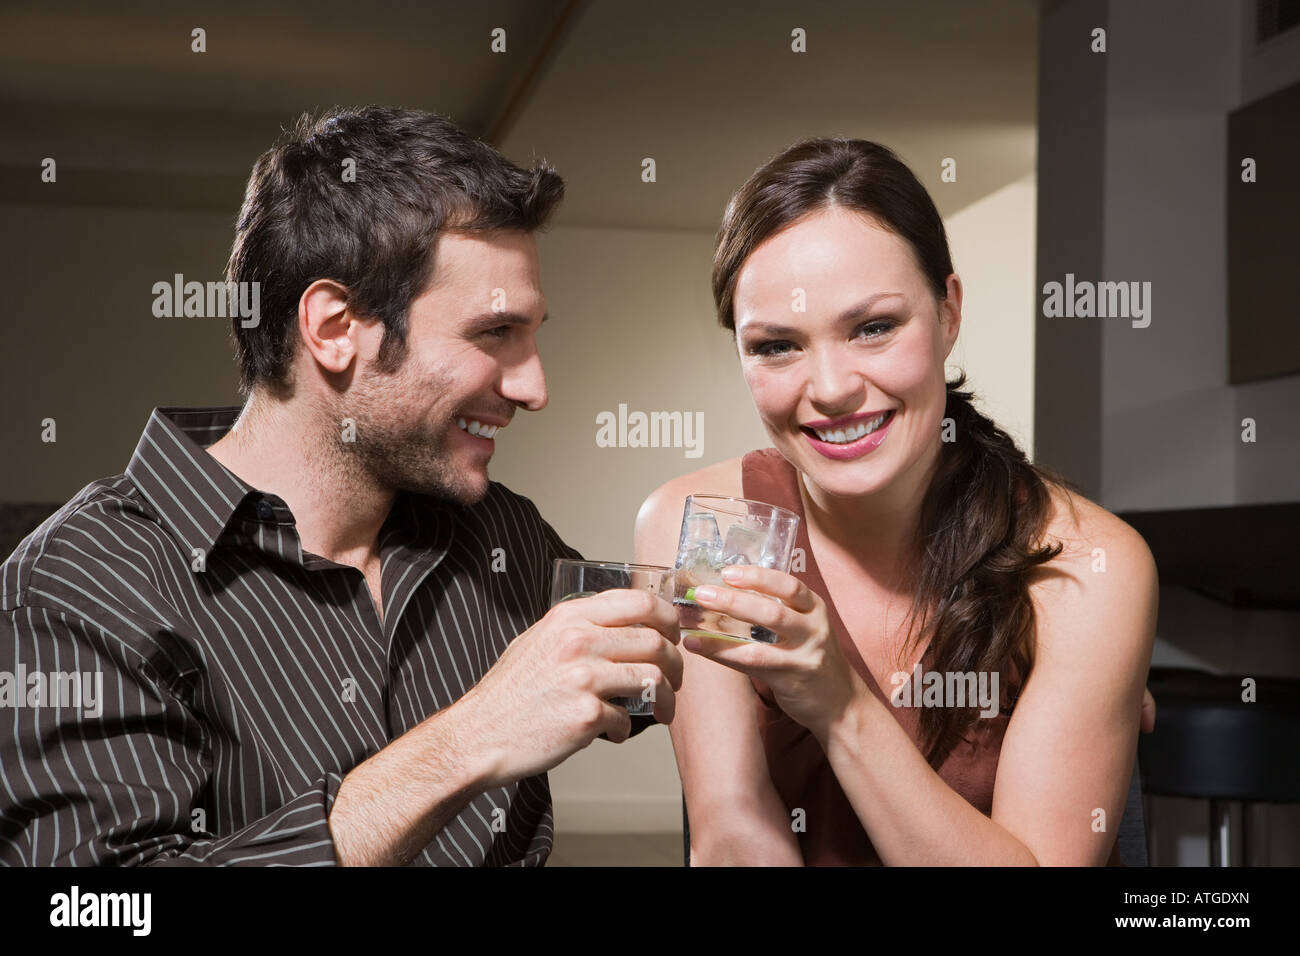 Par de beber cócteles Foto de stock